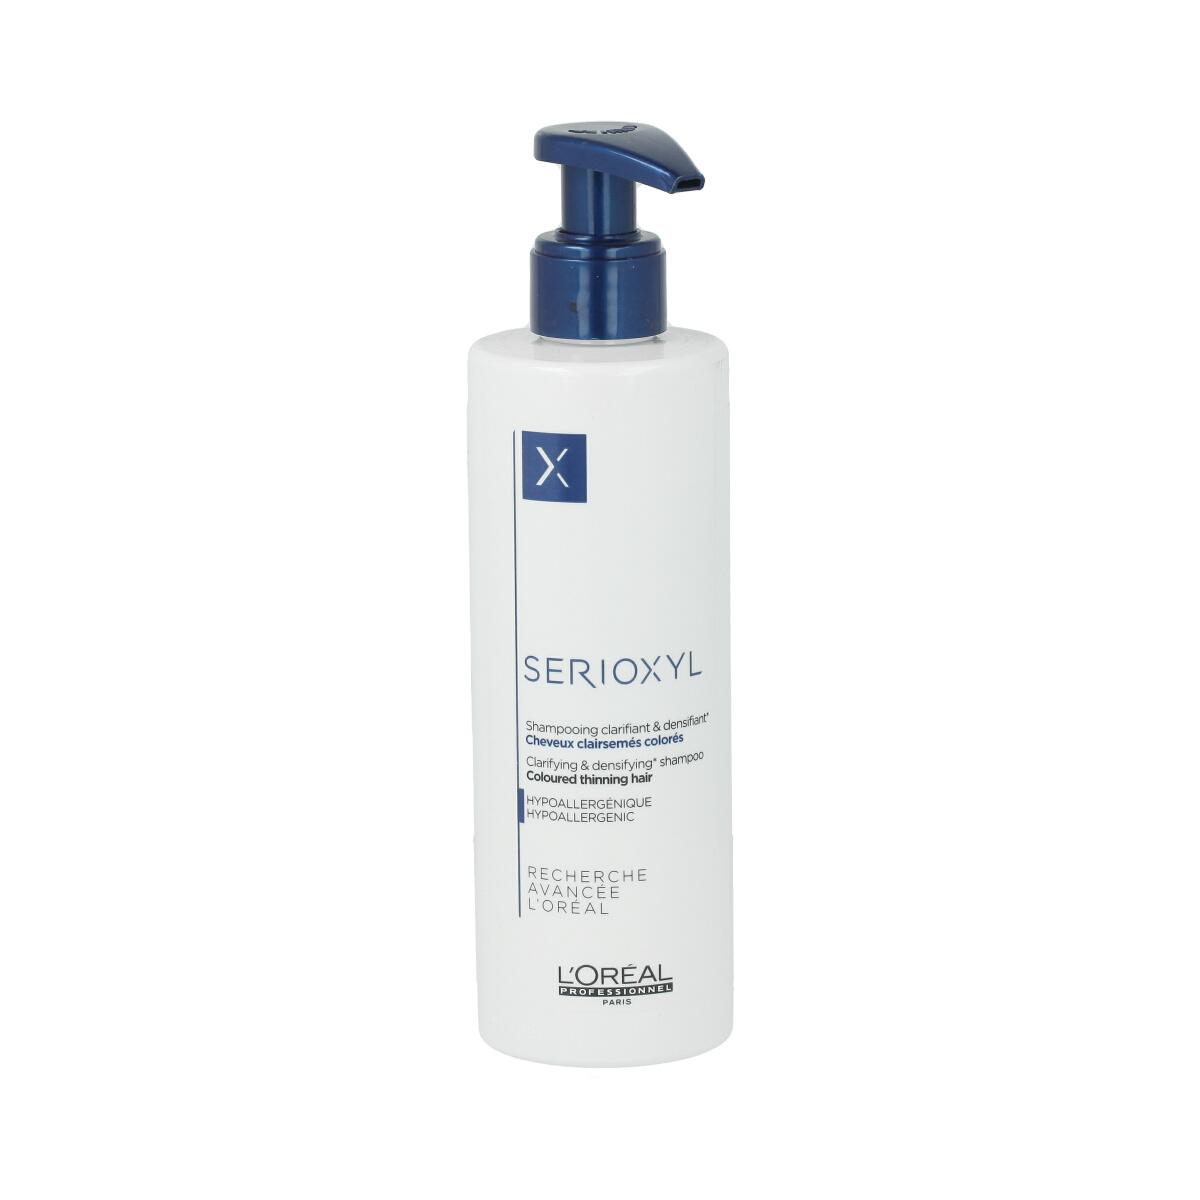 L'Oréal Professionnel Serioxyl Coloured Thinning Hair Shampoo 250 ml 19849